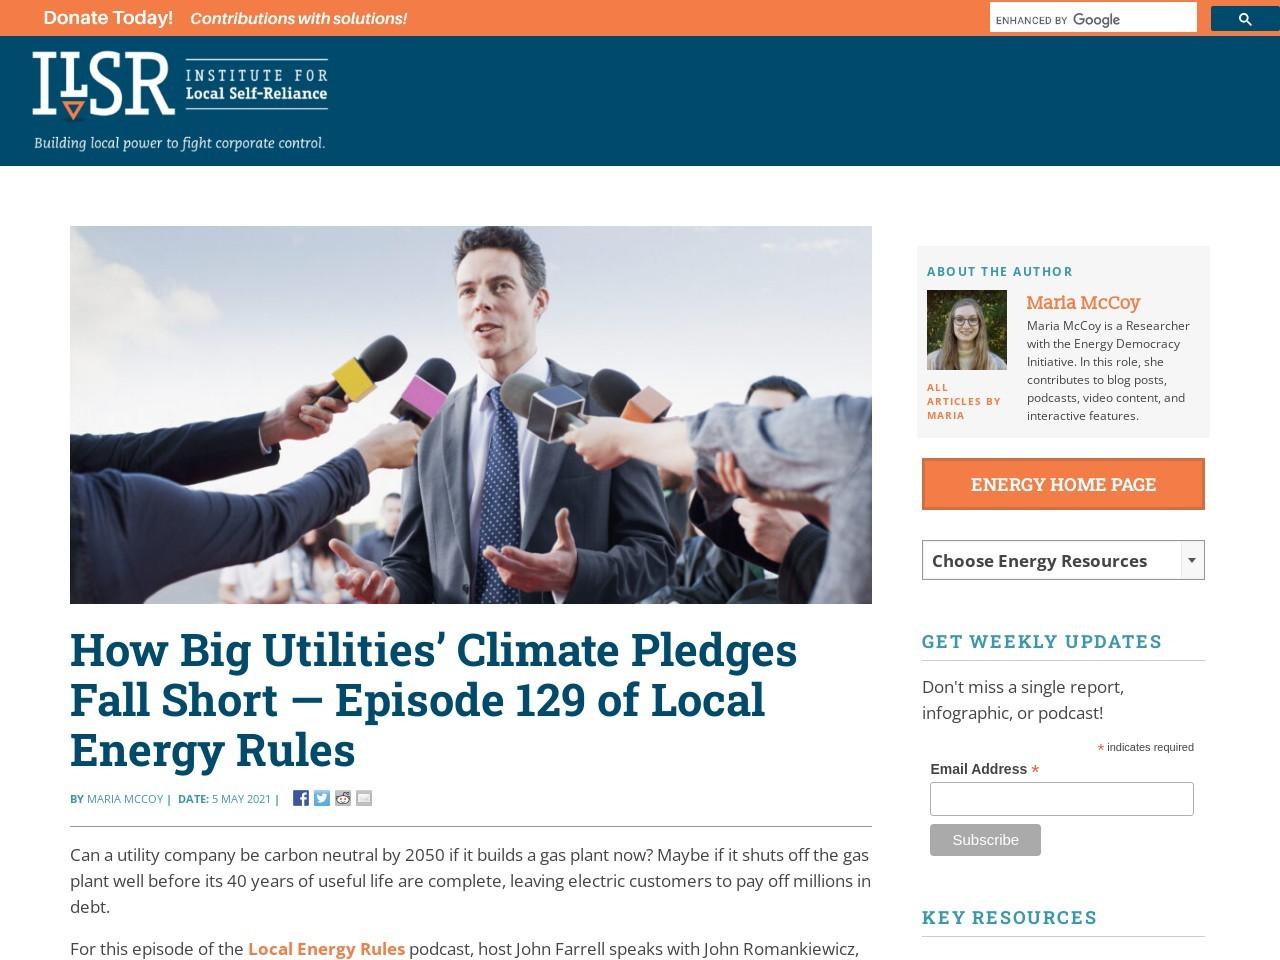 How Big Utilities' Climate Pledges Fall Short